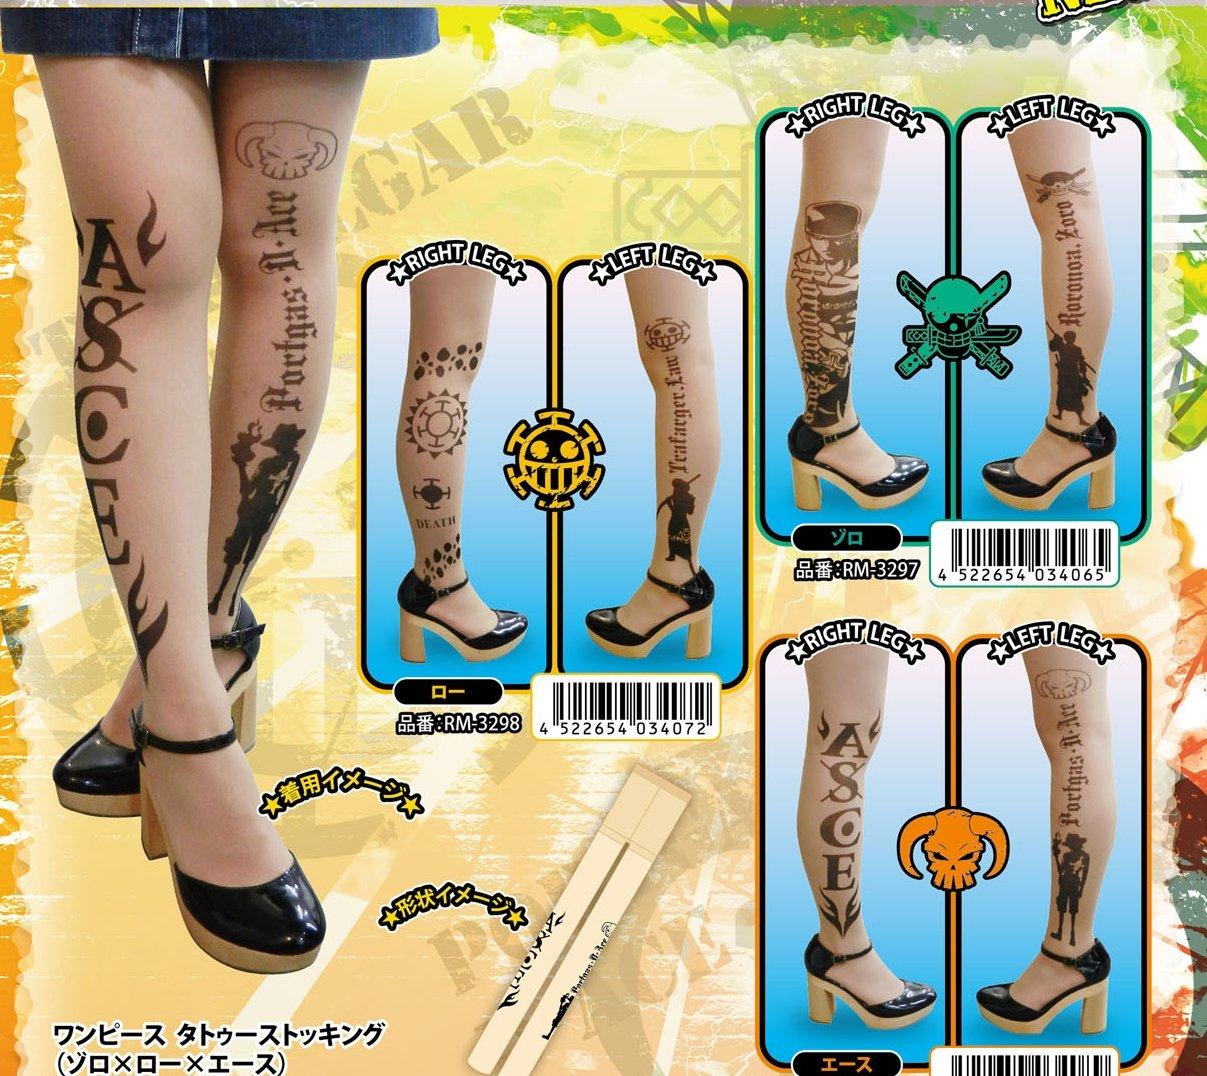 One Piece Zoro medias del tatuaje (jap?n importaci?n): Amazon.es ...